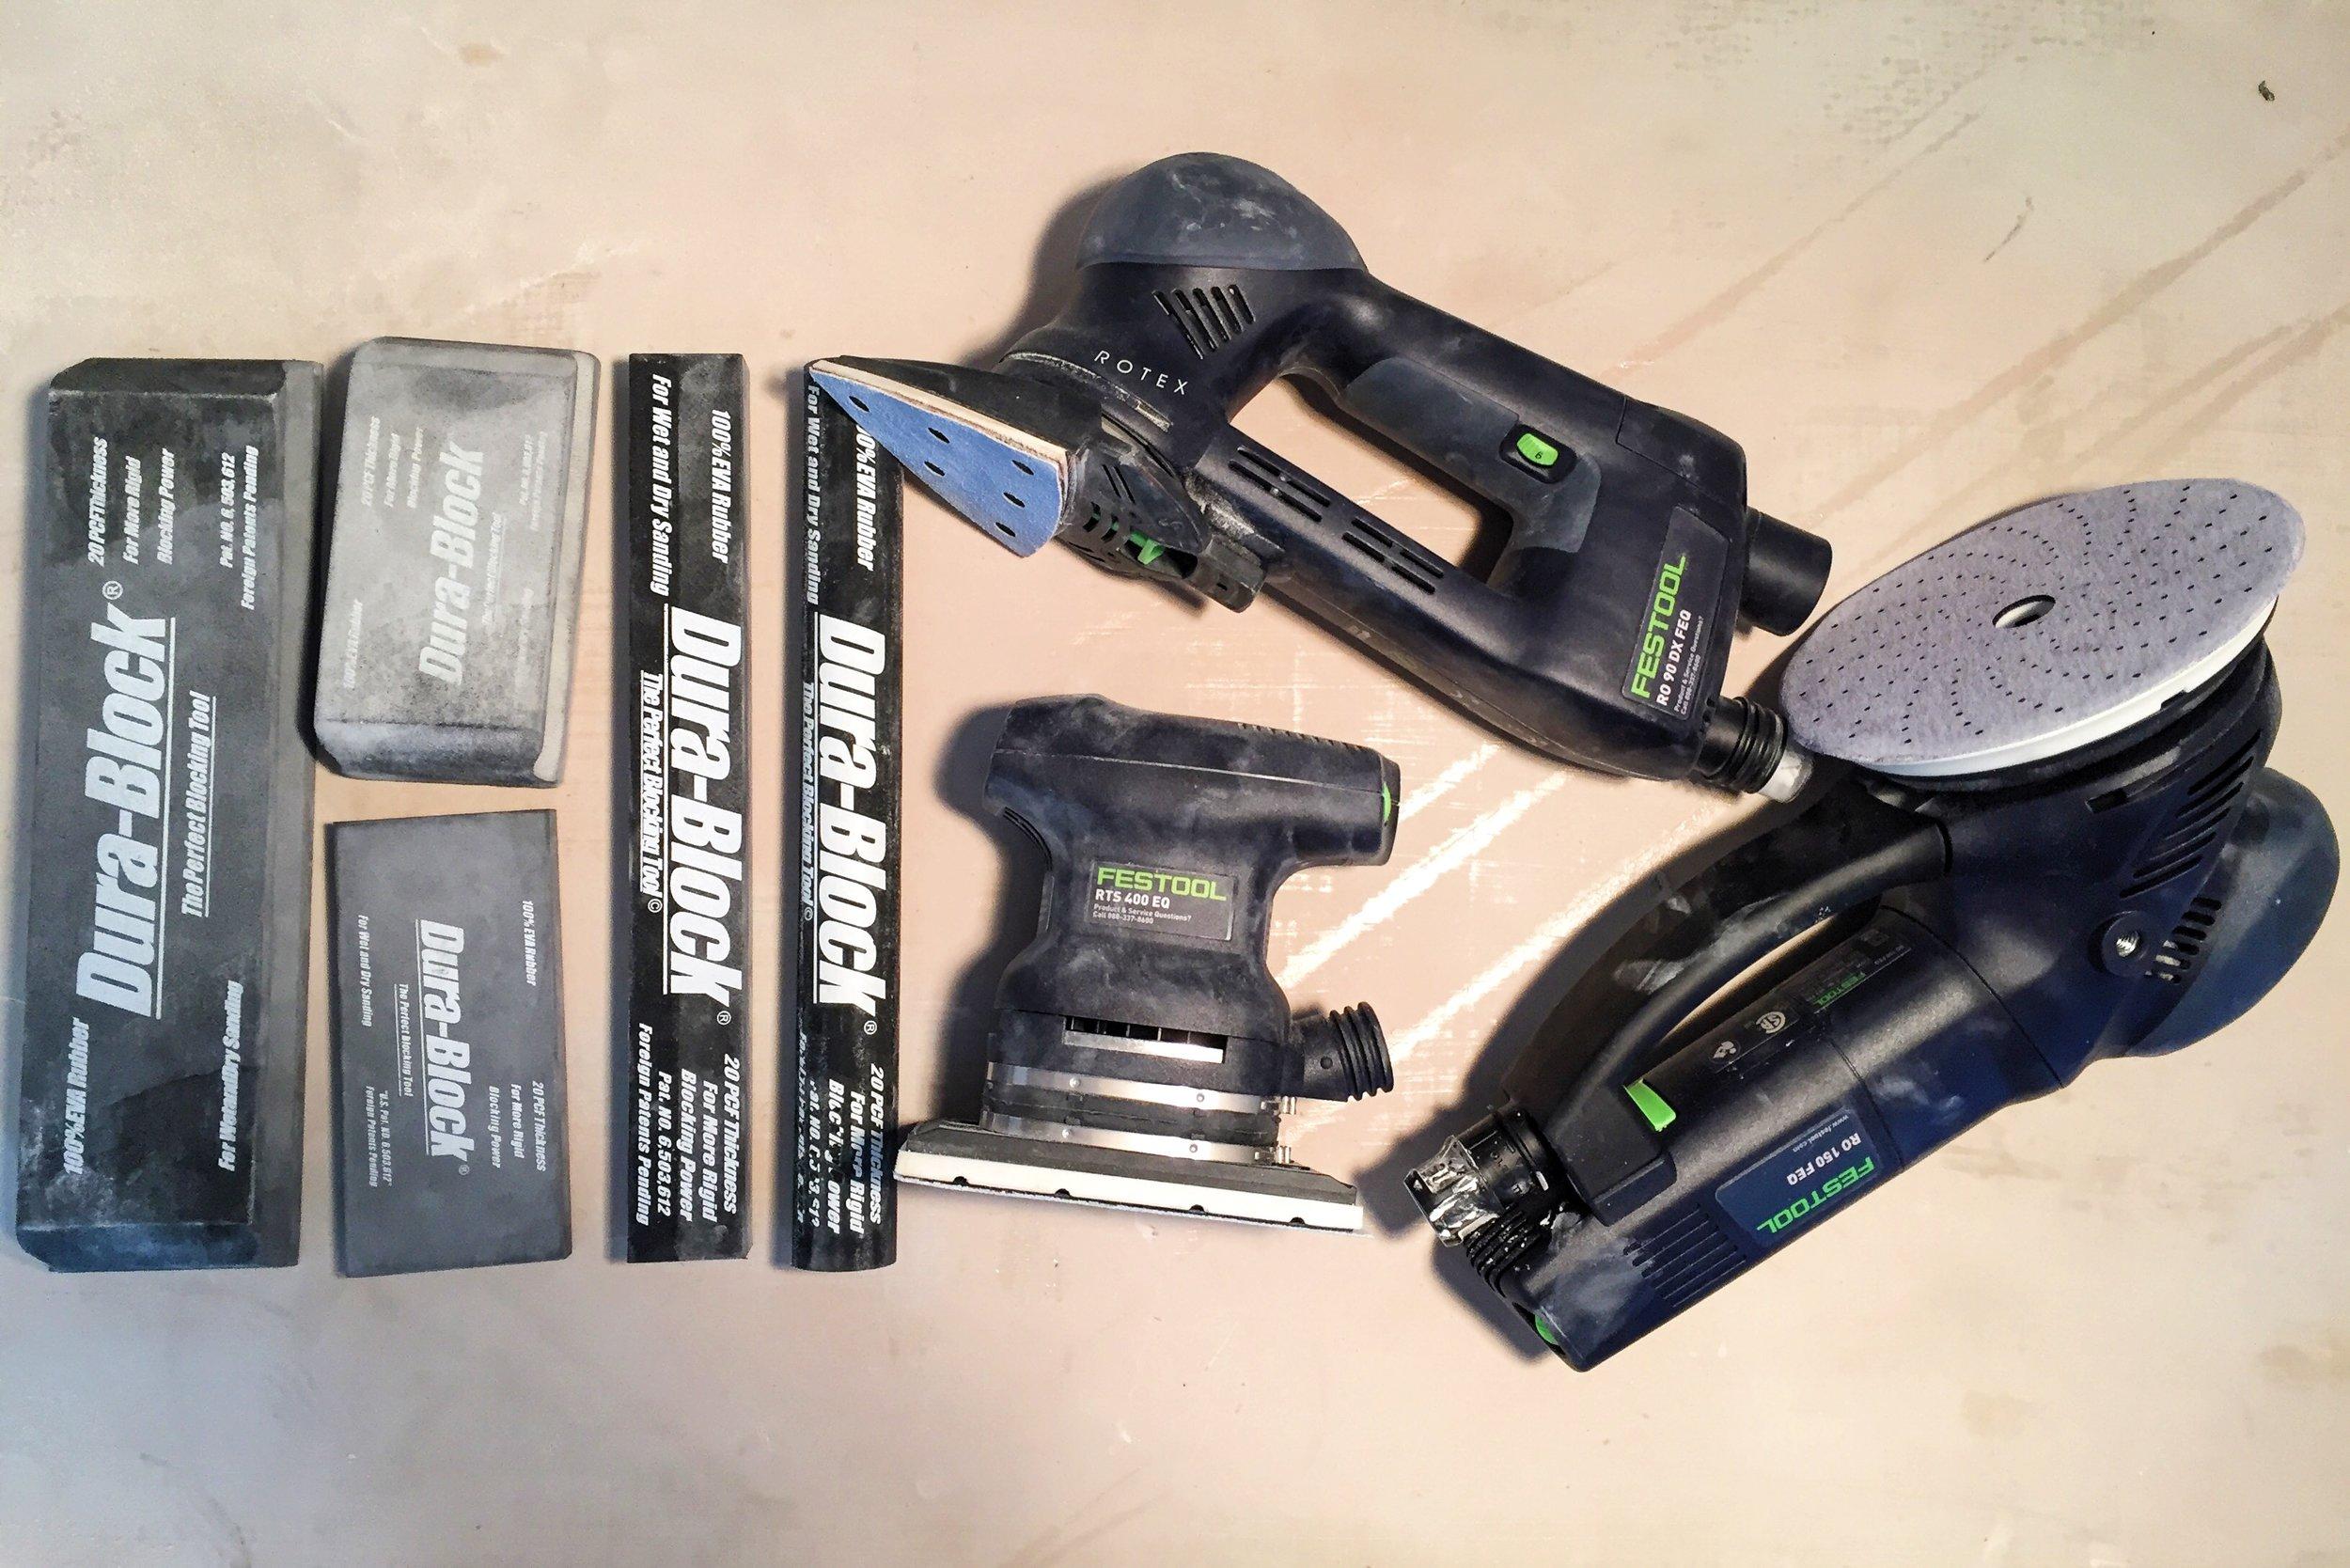 Matt's tools of choice